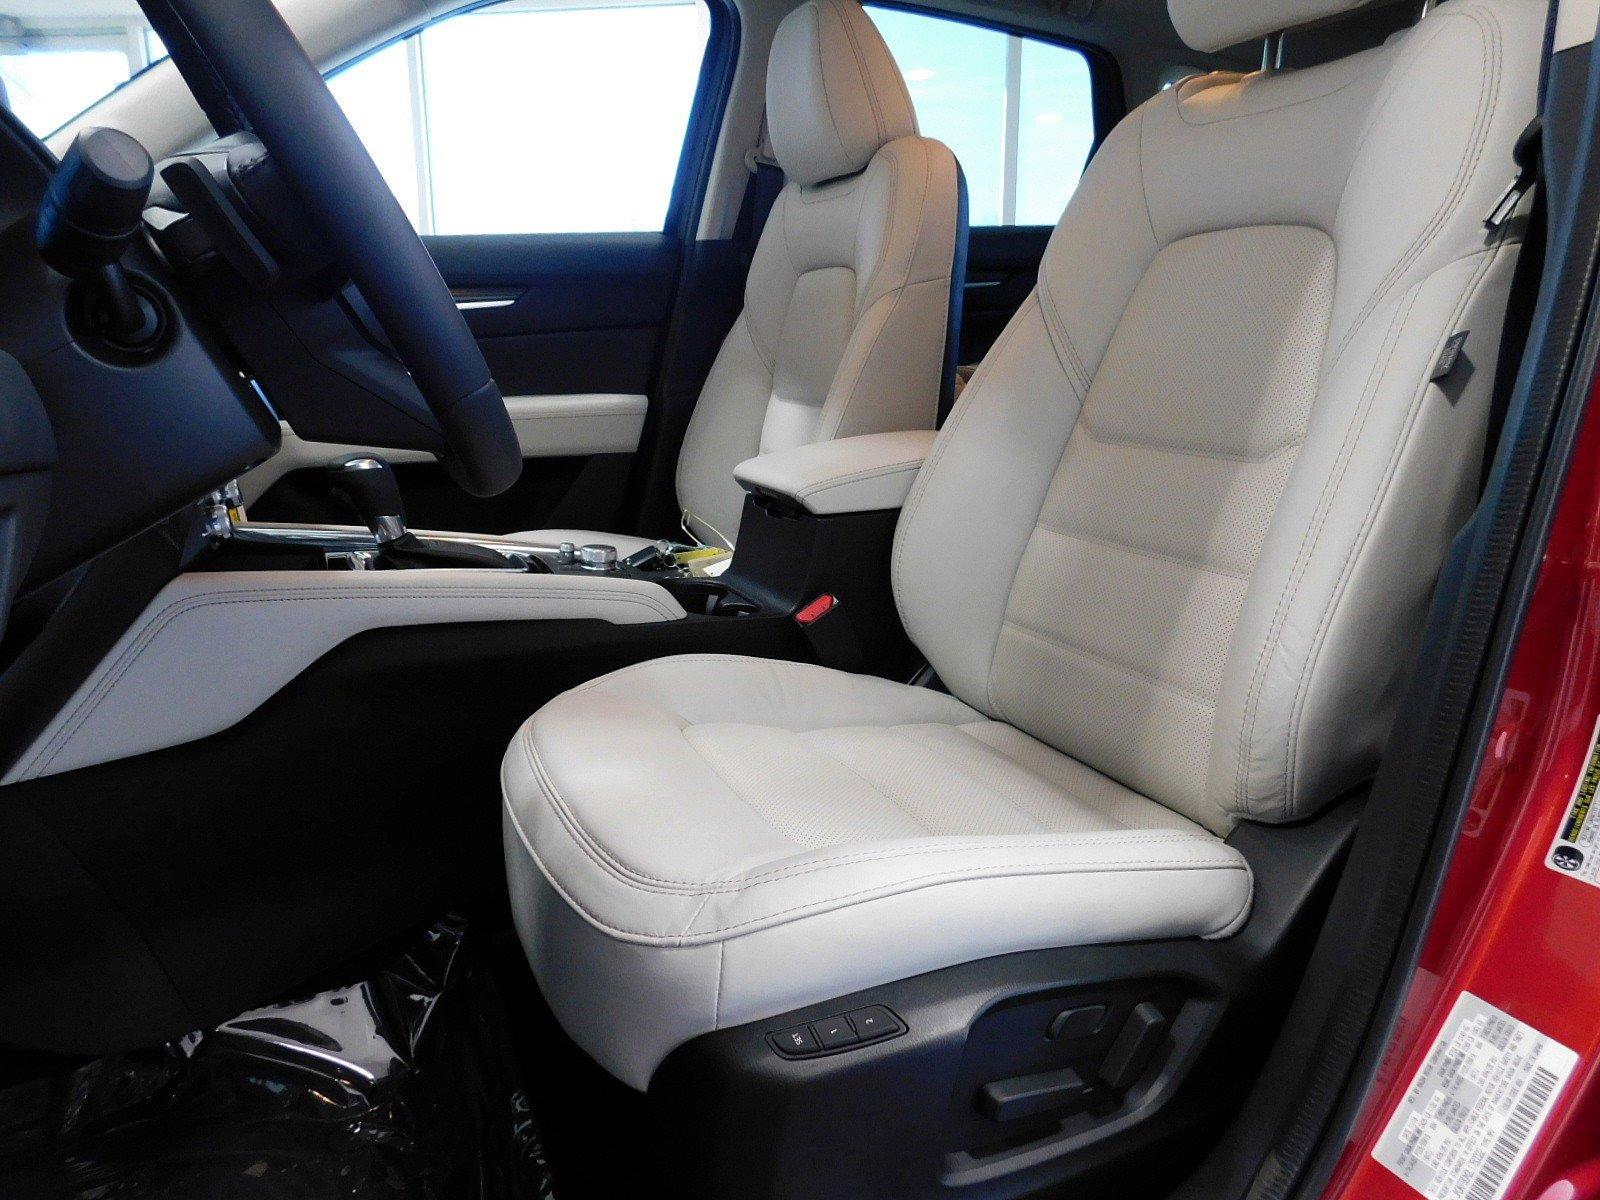 New 2020 Mazda CX-5 Grand Touring